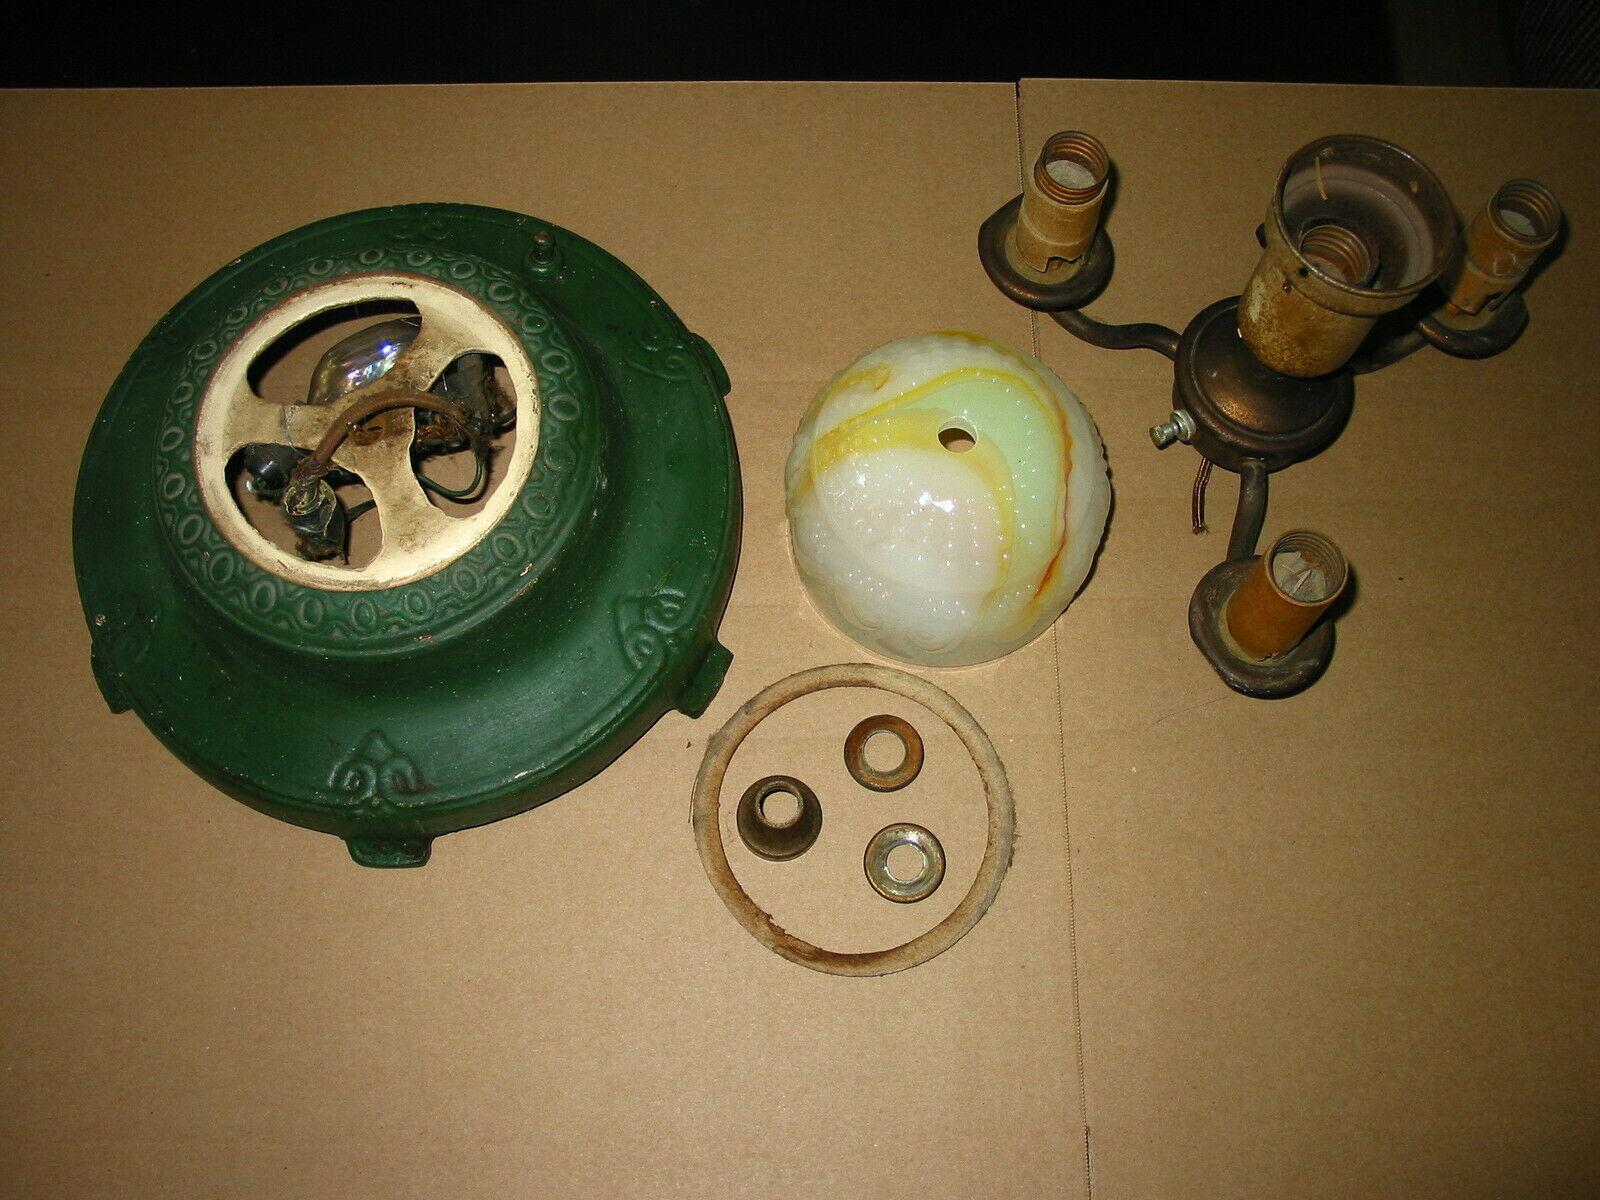 Akro Houze Green Caramel Slag Glass Floor Lamp Parts Cast Iron Base - $24.95